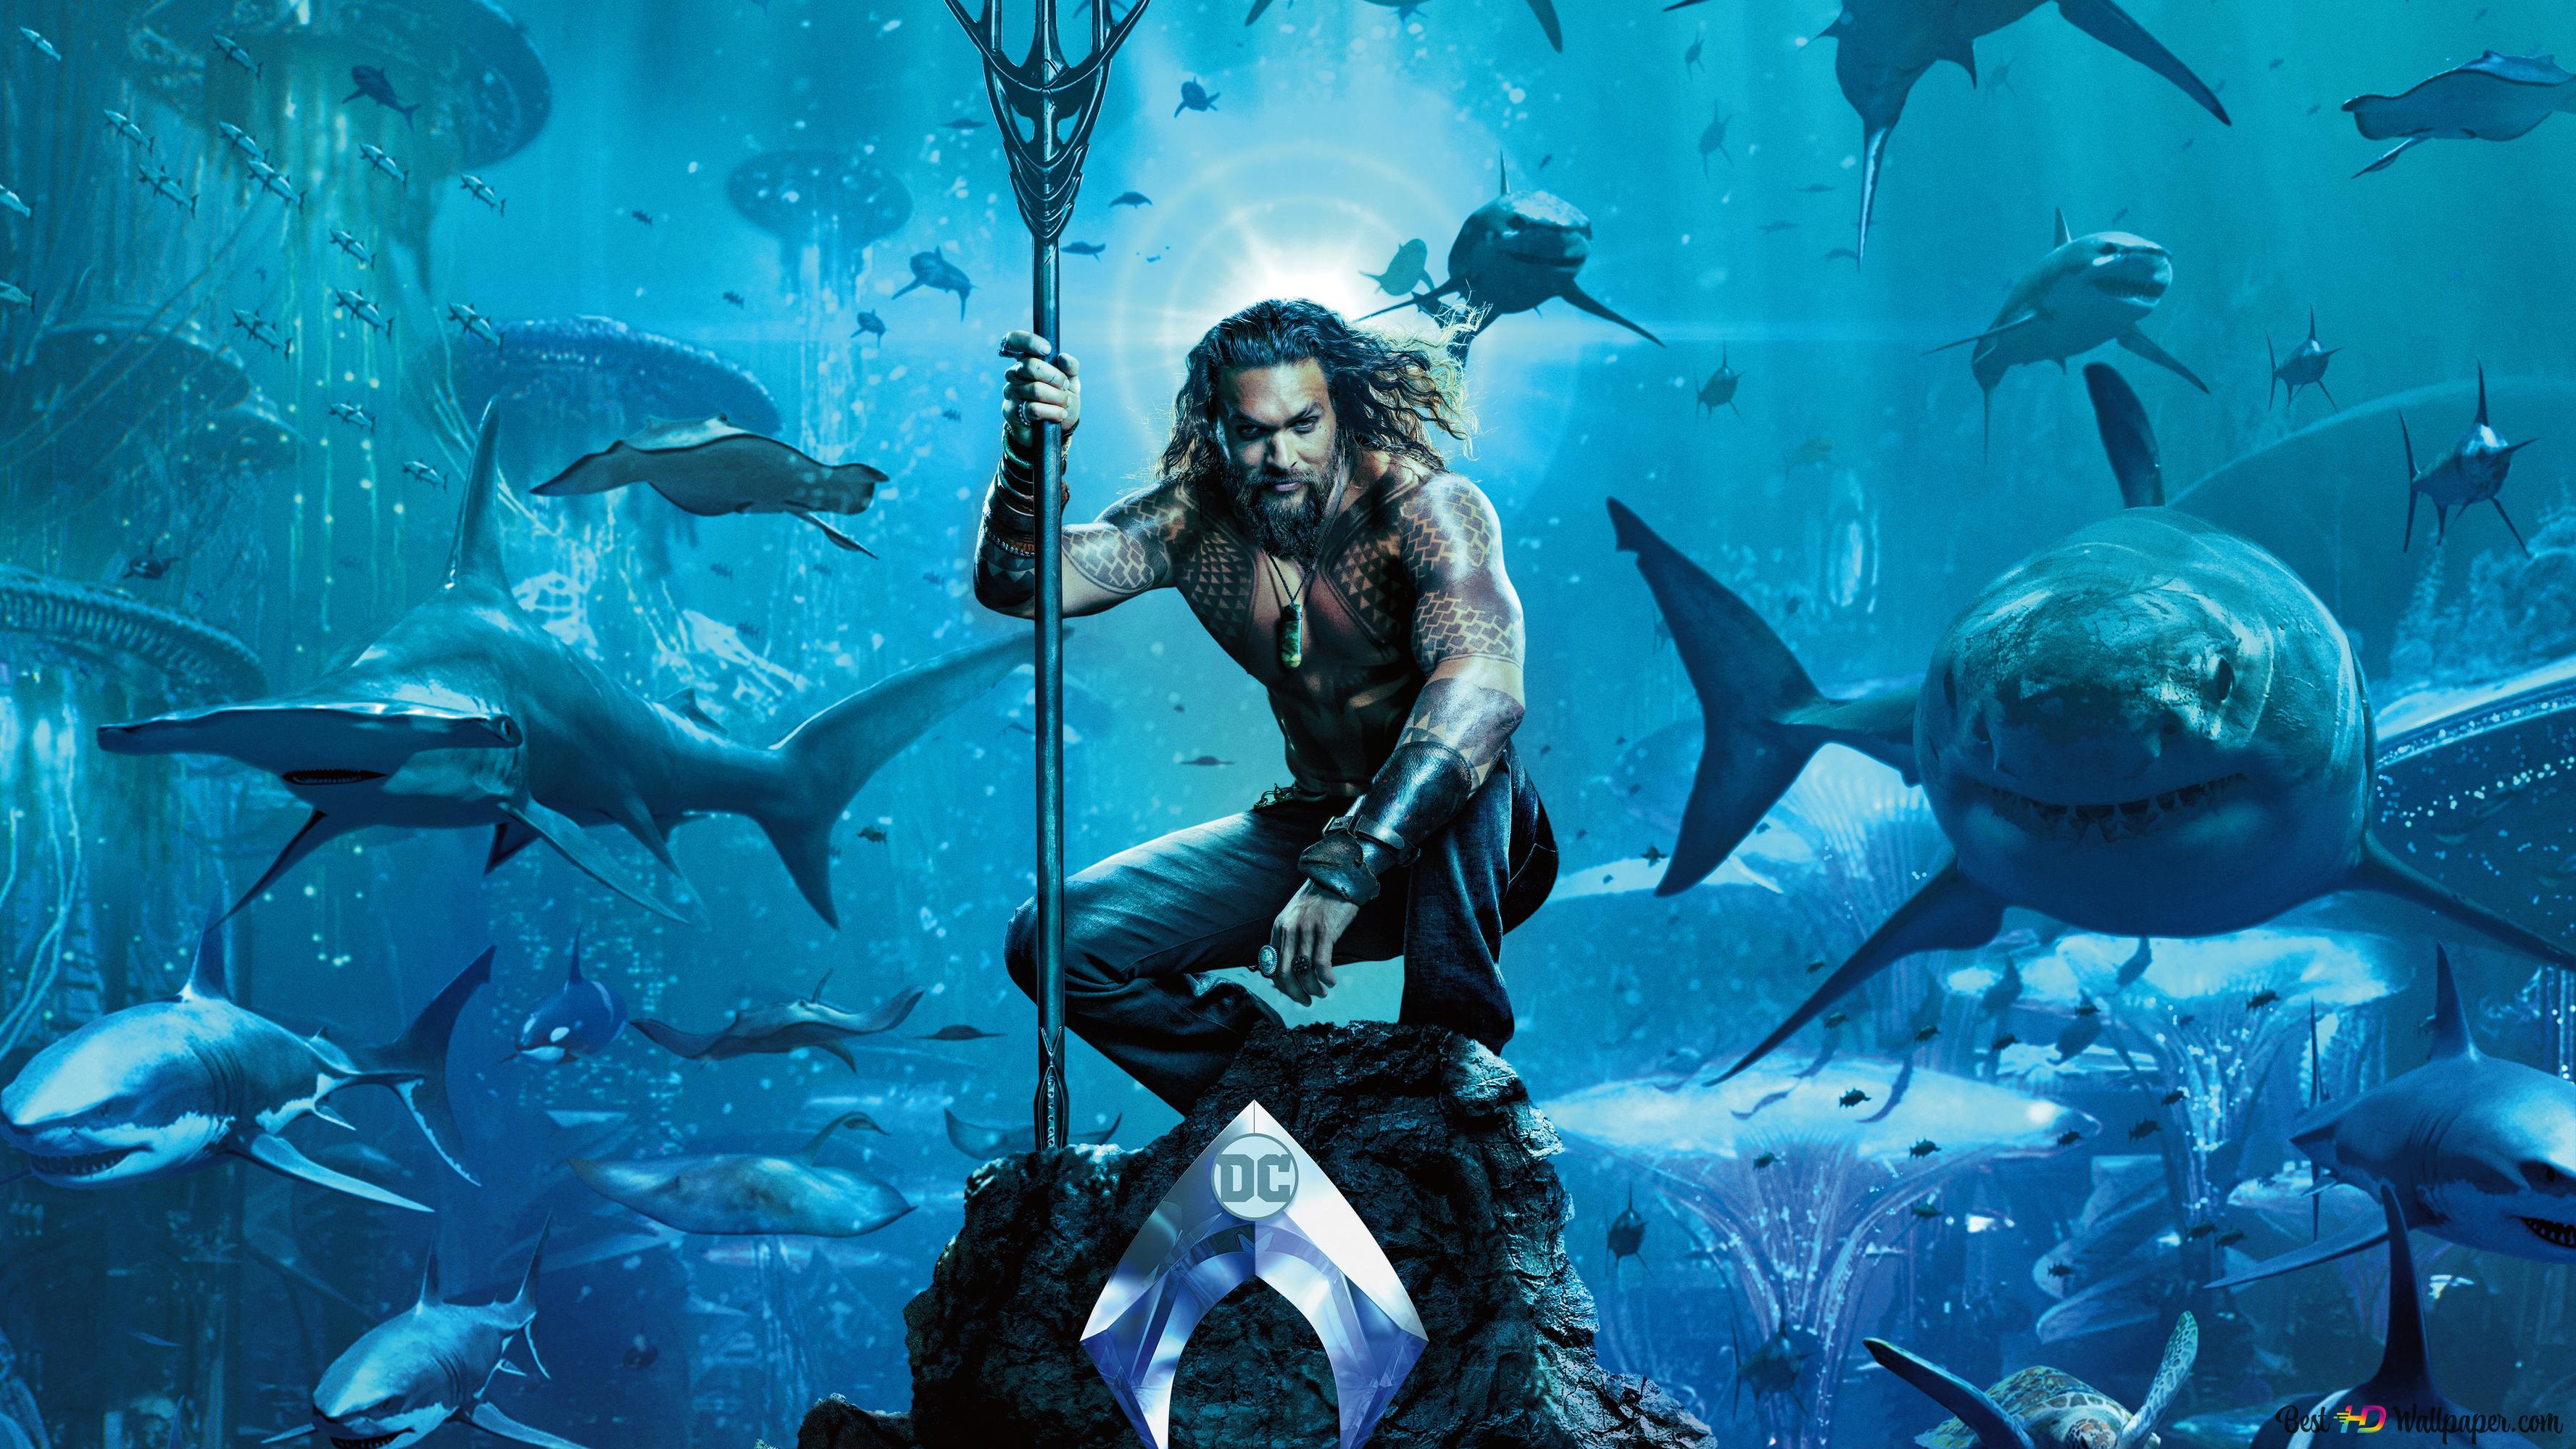 Descargar Fondo De Pantalla Aquaman Atlantis Tiburones